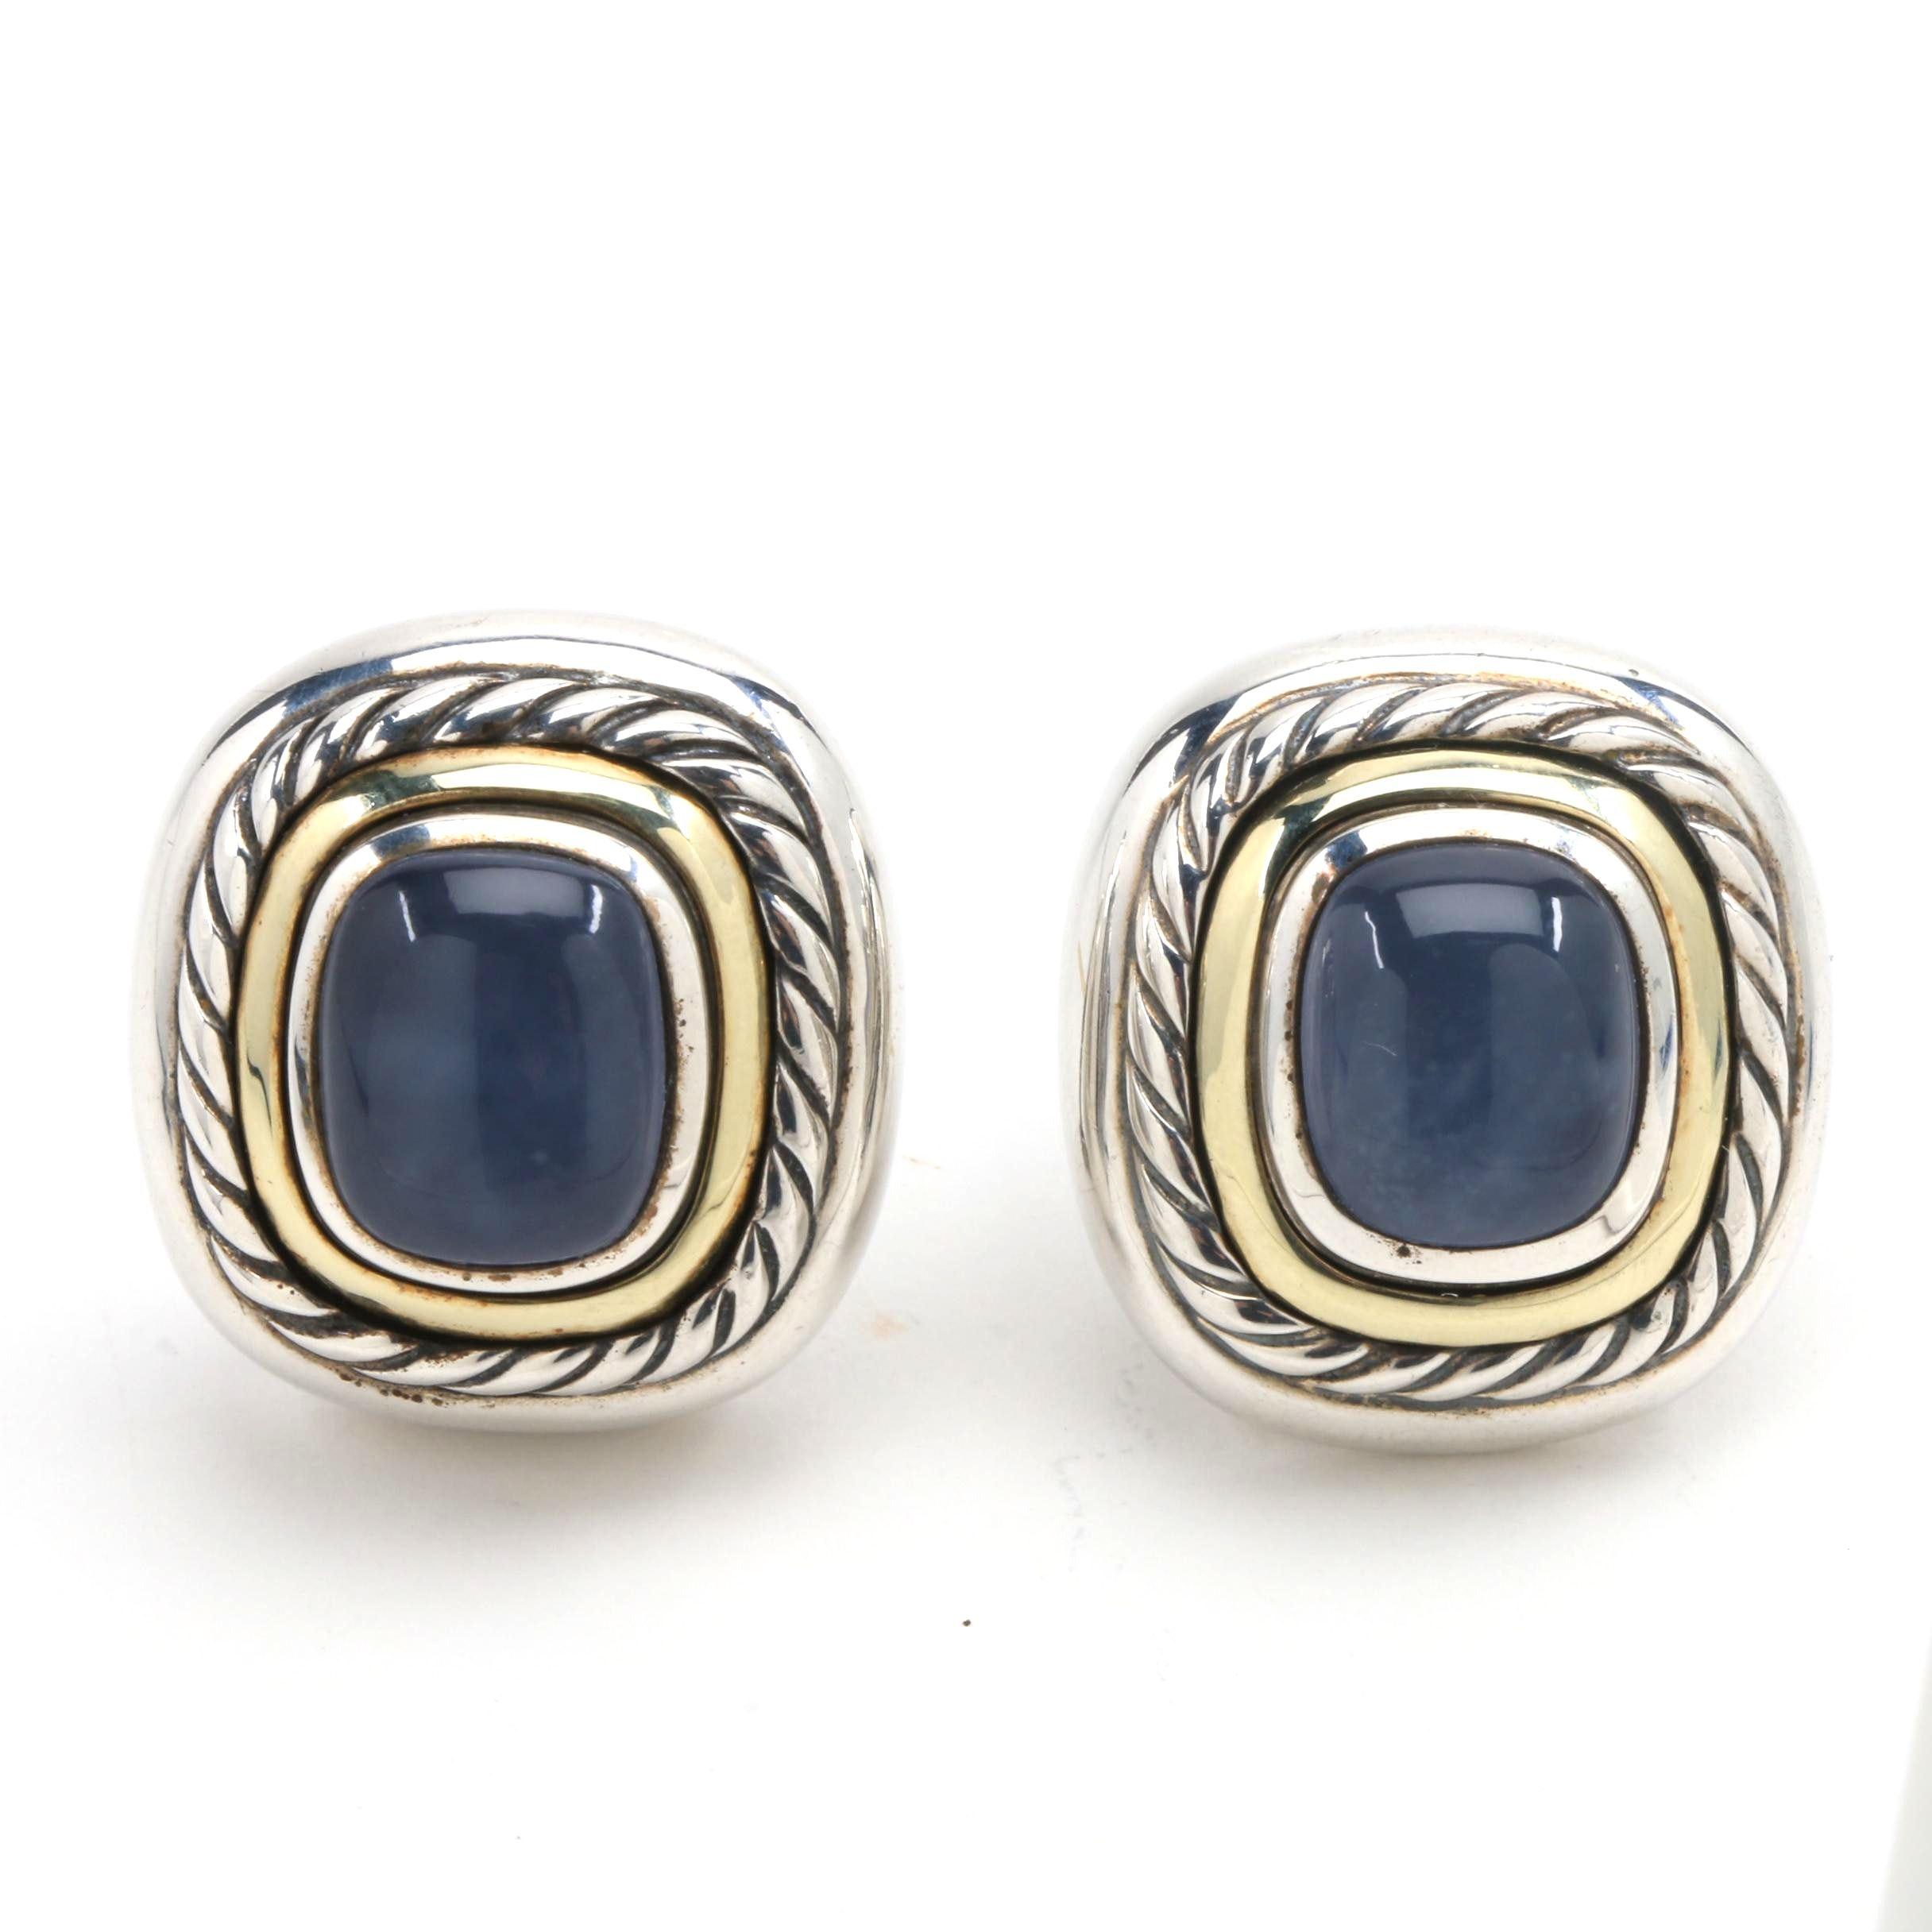 David Yurman Sterling Silver and Calcedony Post Earrings